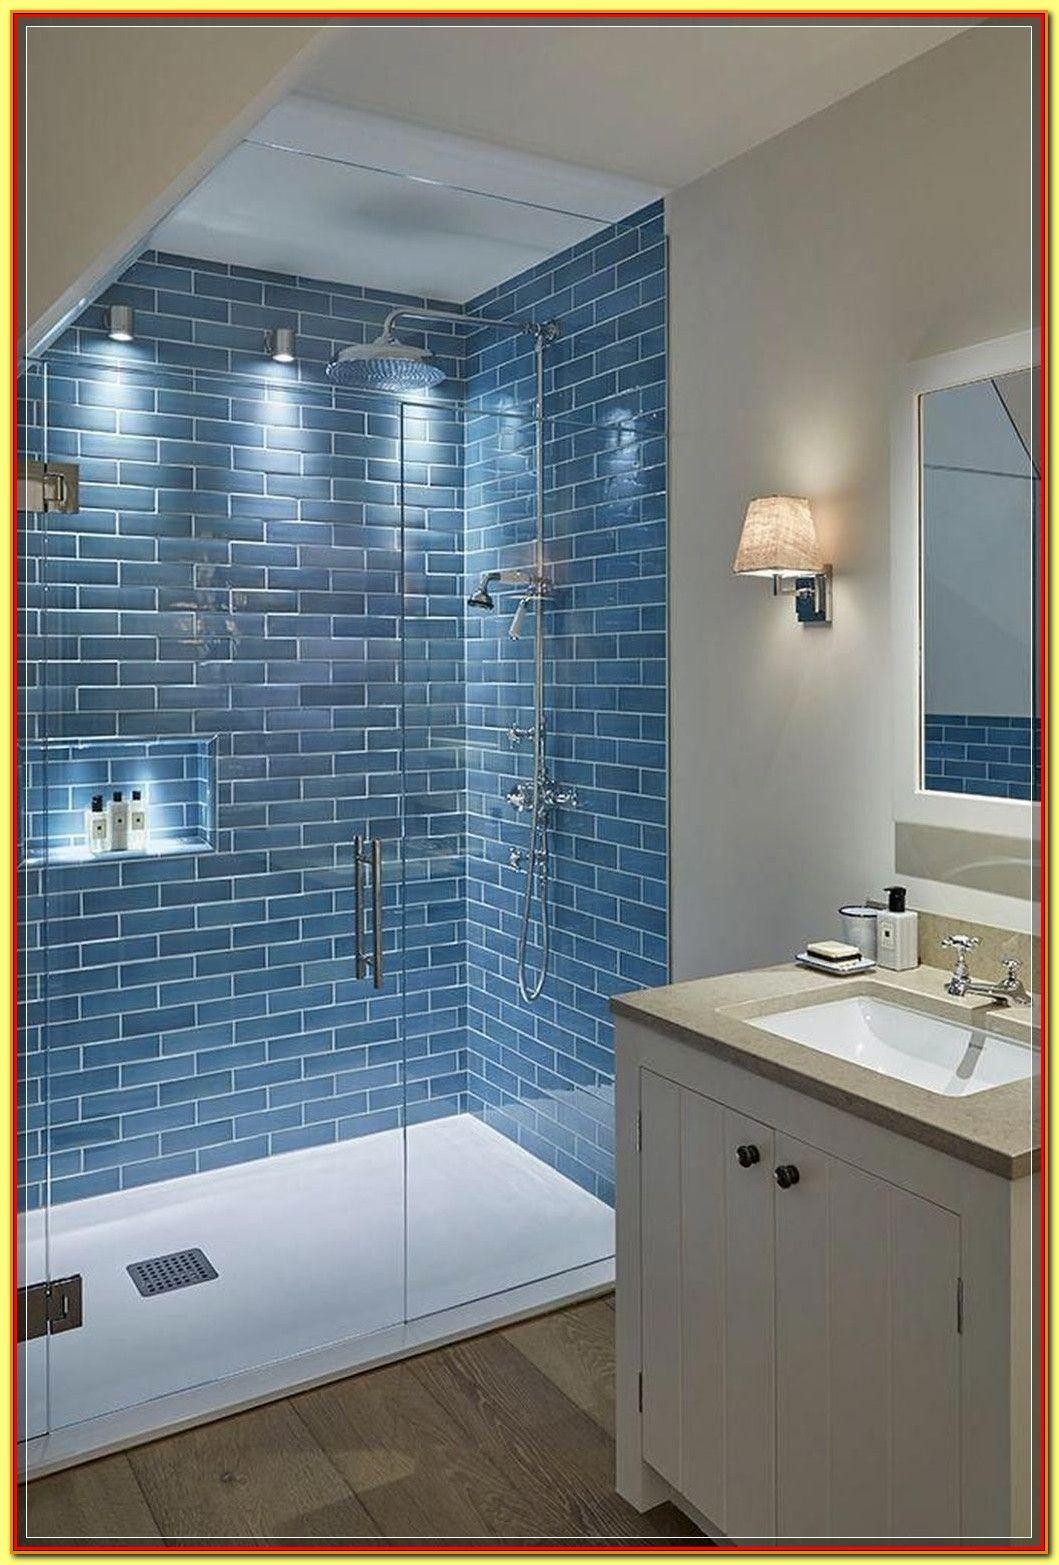 Pin On Bathroom Ideas On A Budget